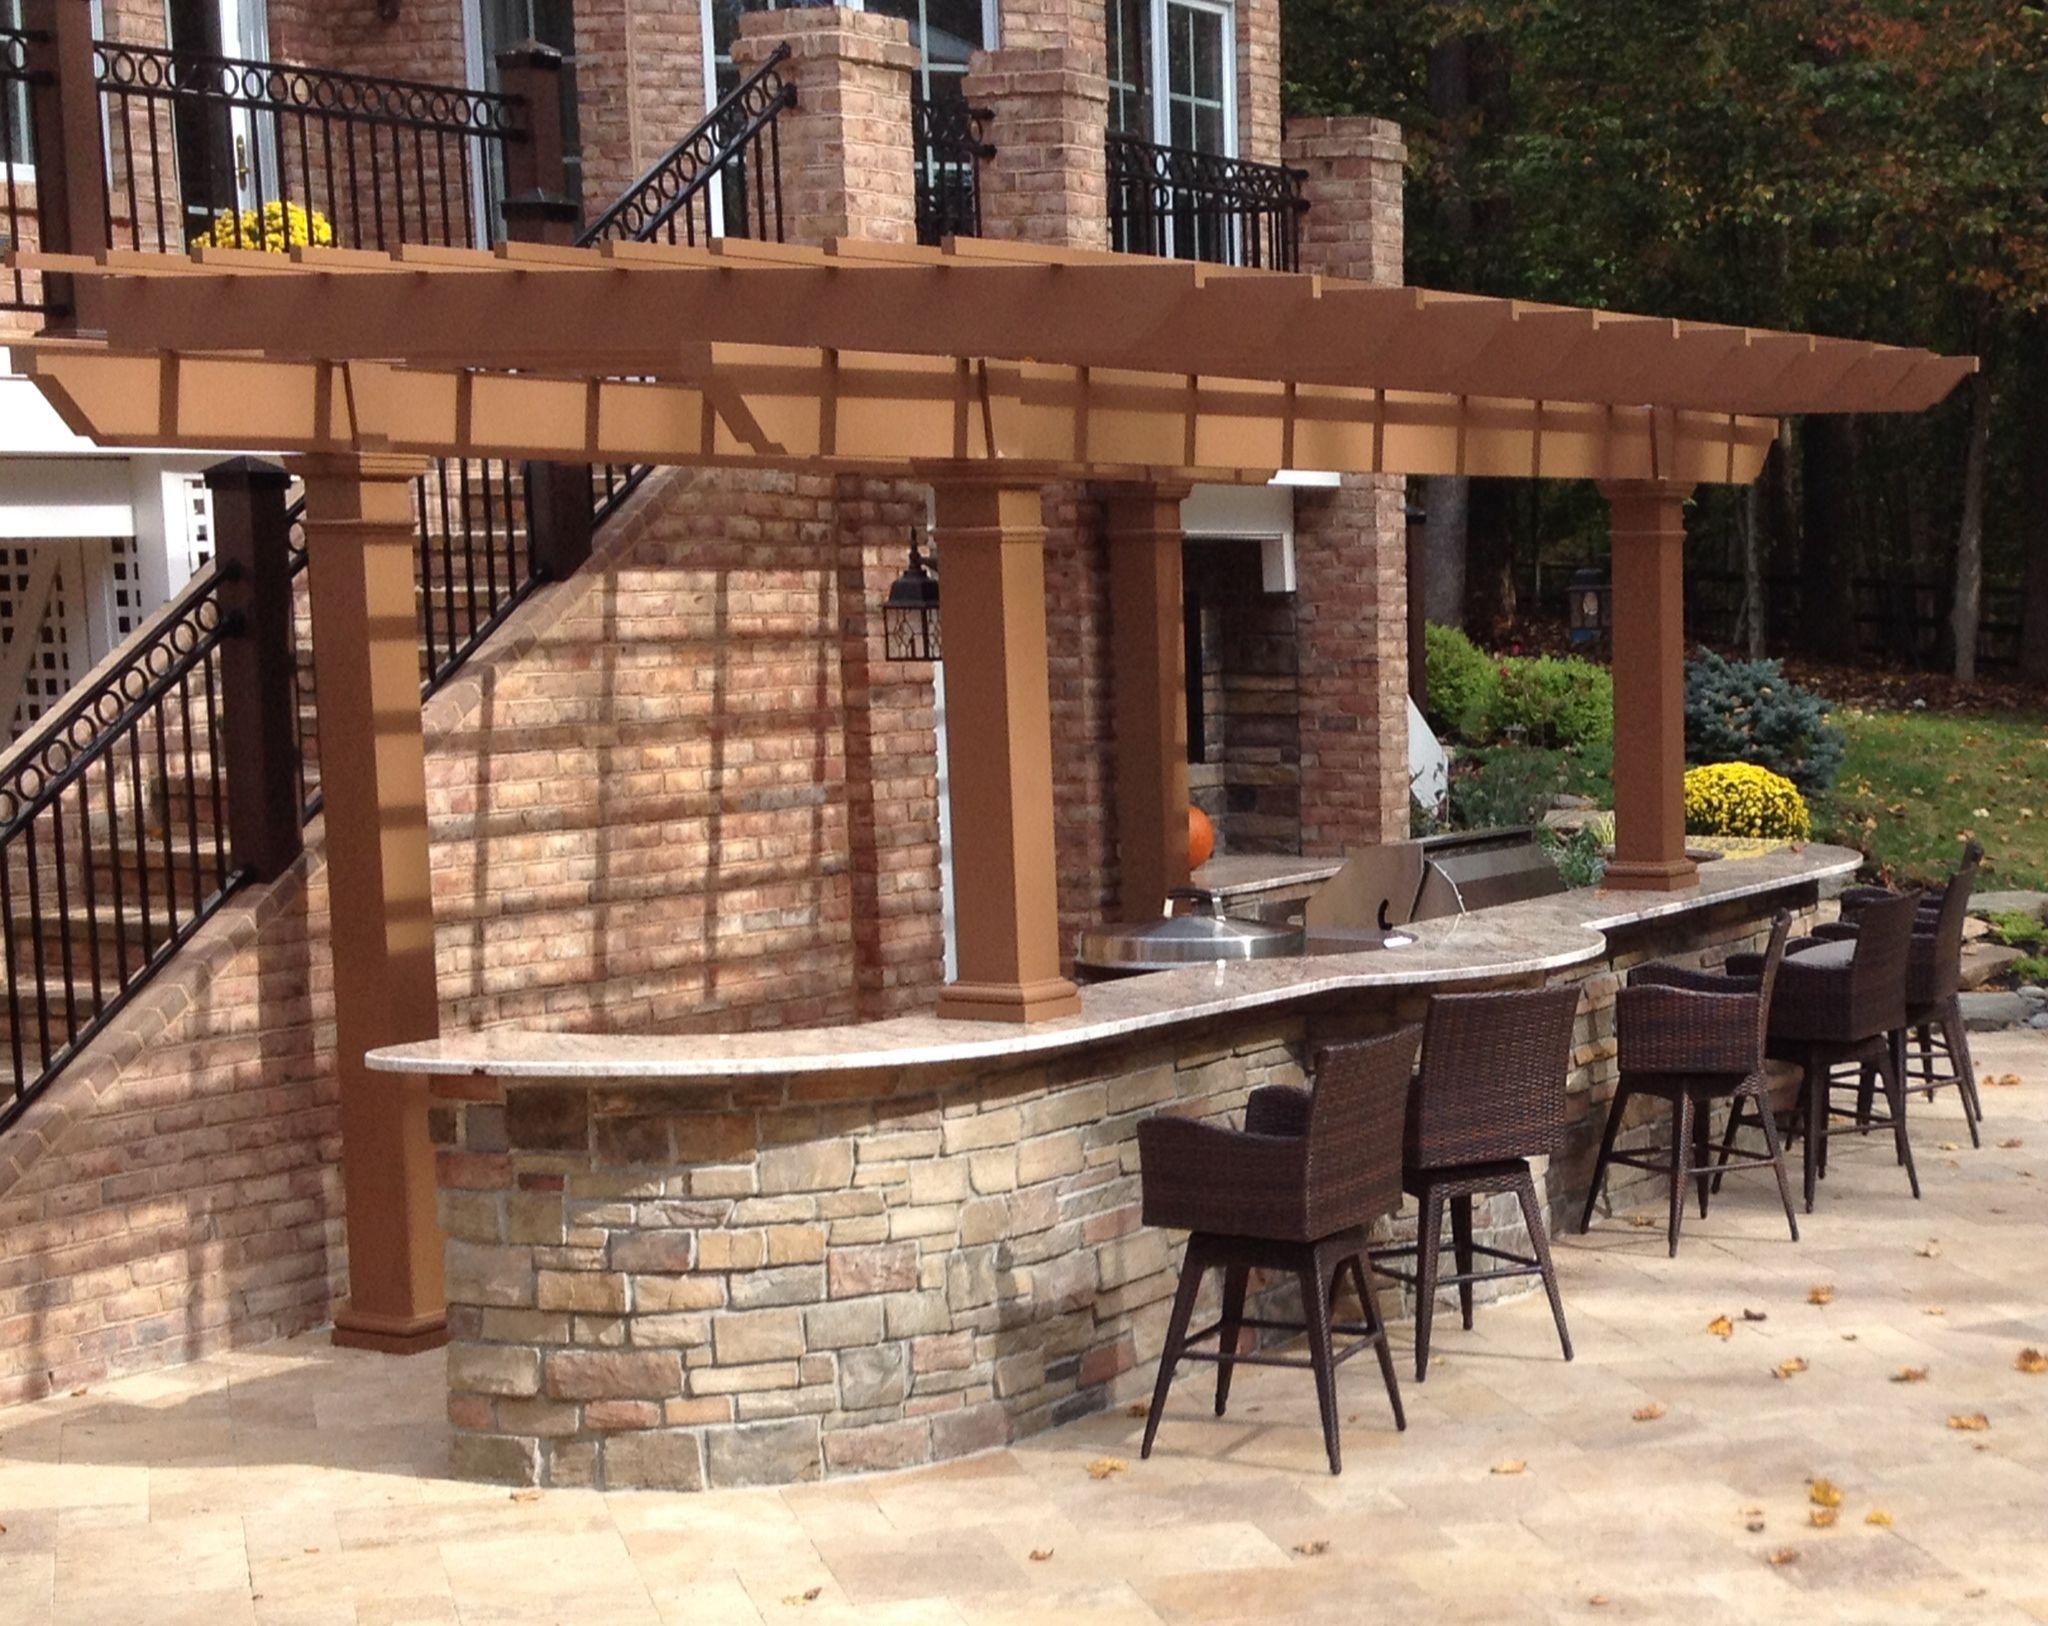 Painted Trex Pergola Kit Over Outdoor Kitchen Maryland Pergola Plans Design Pergola Pergola Designs